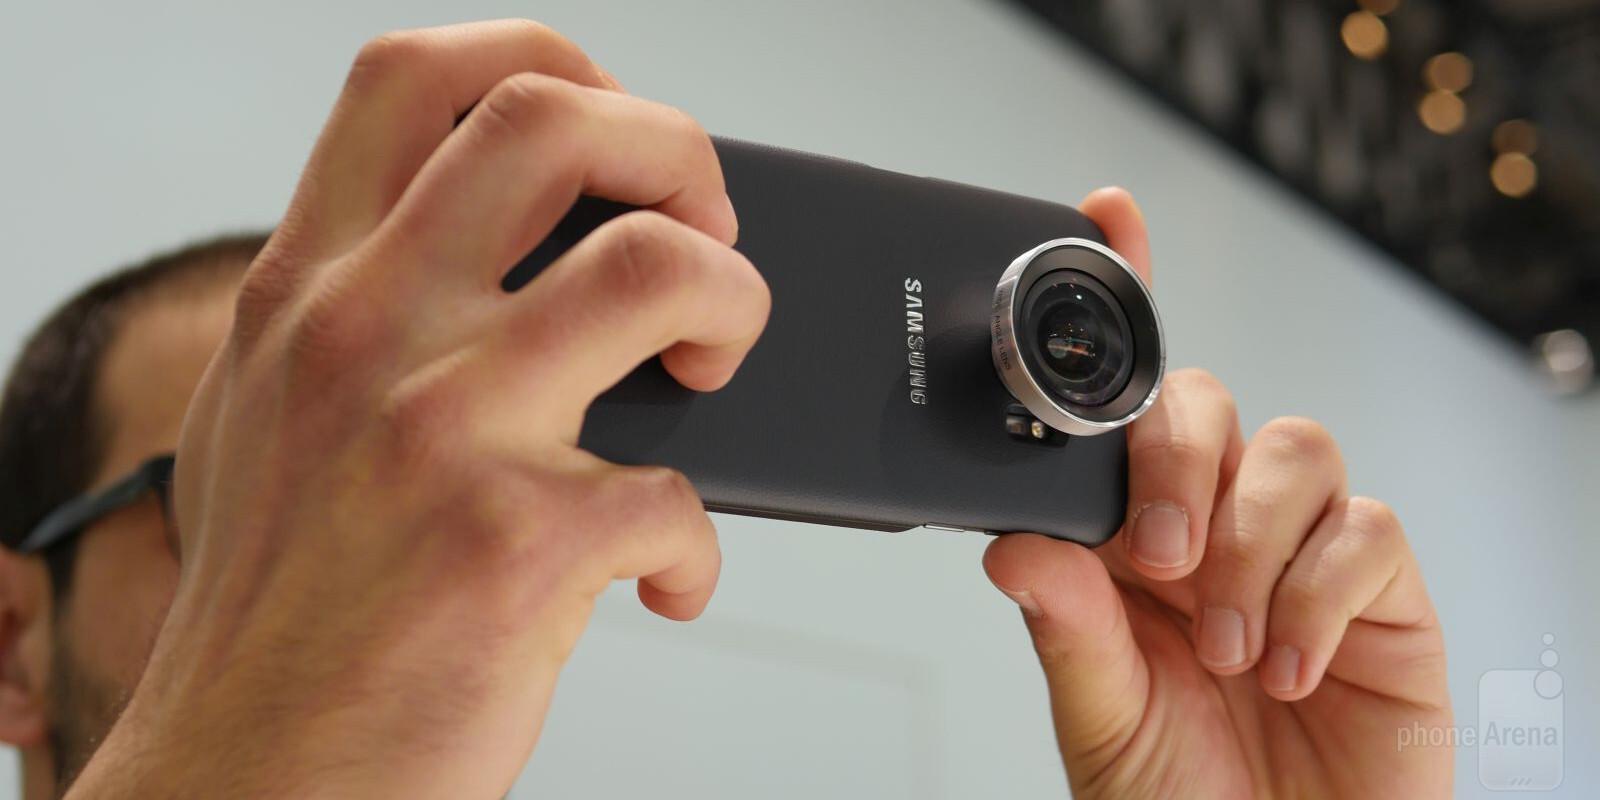 Case Design verizon flip phone cases : Camera Lens cases for Samsung Galaxy S7/S7 edge hands-on : PhoneArena ...